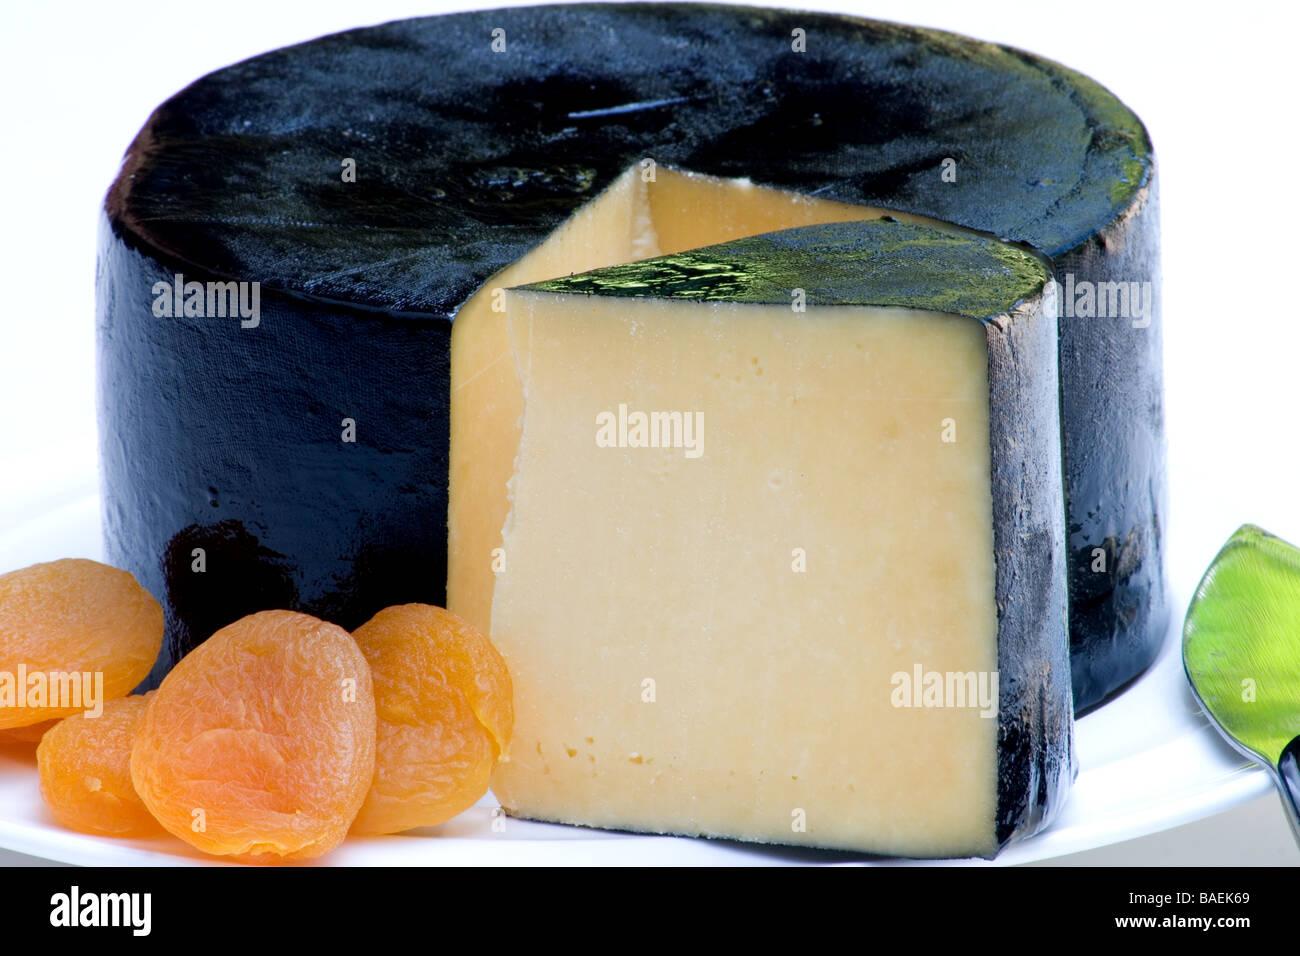 Parmesan cheese platter - Stock Image